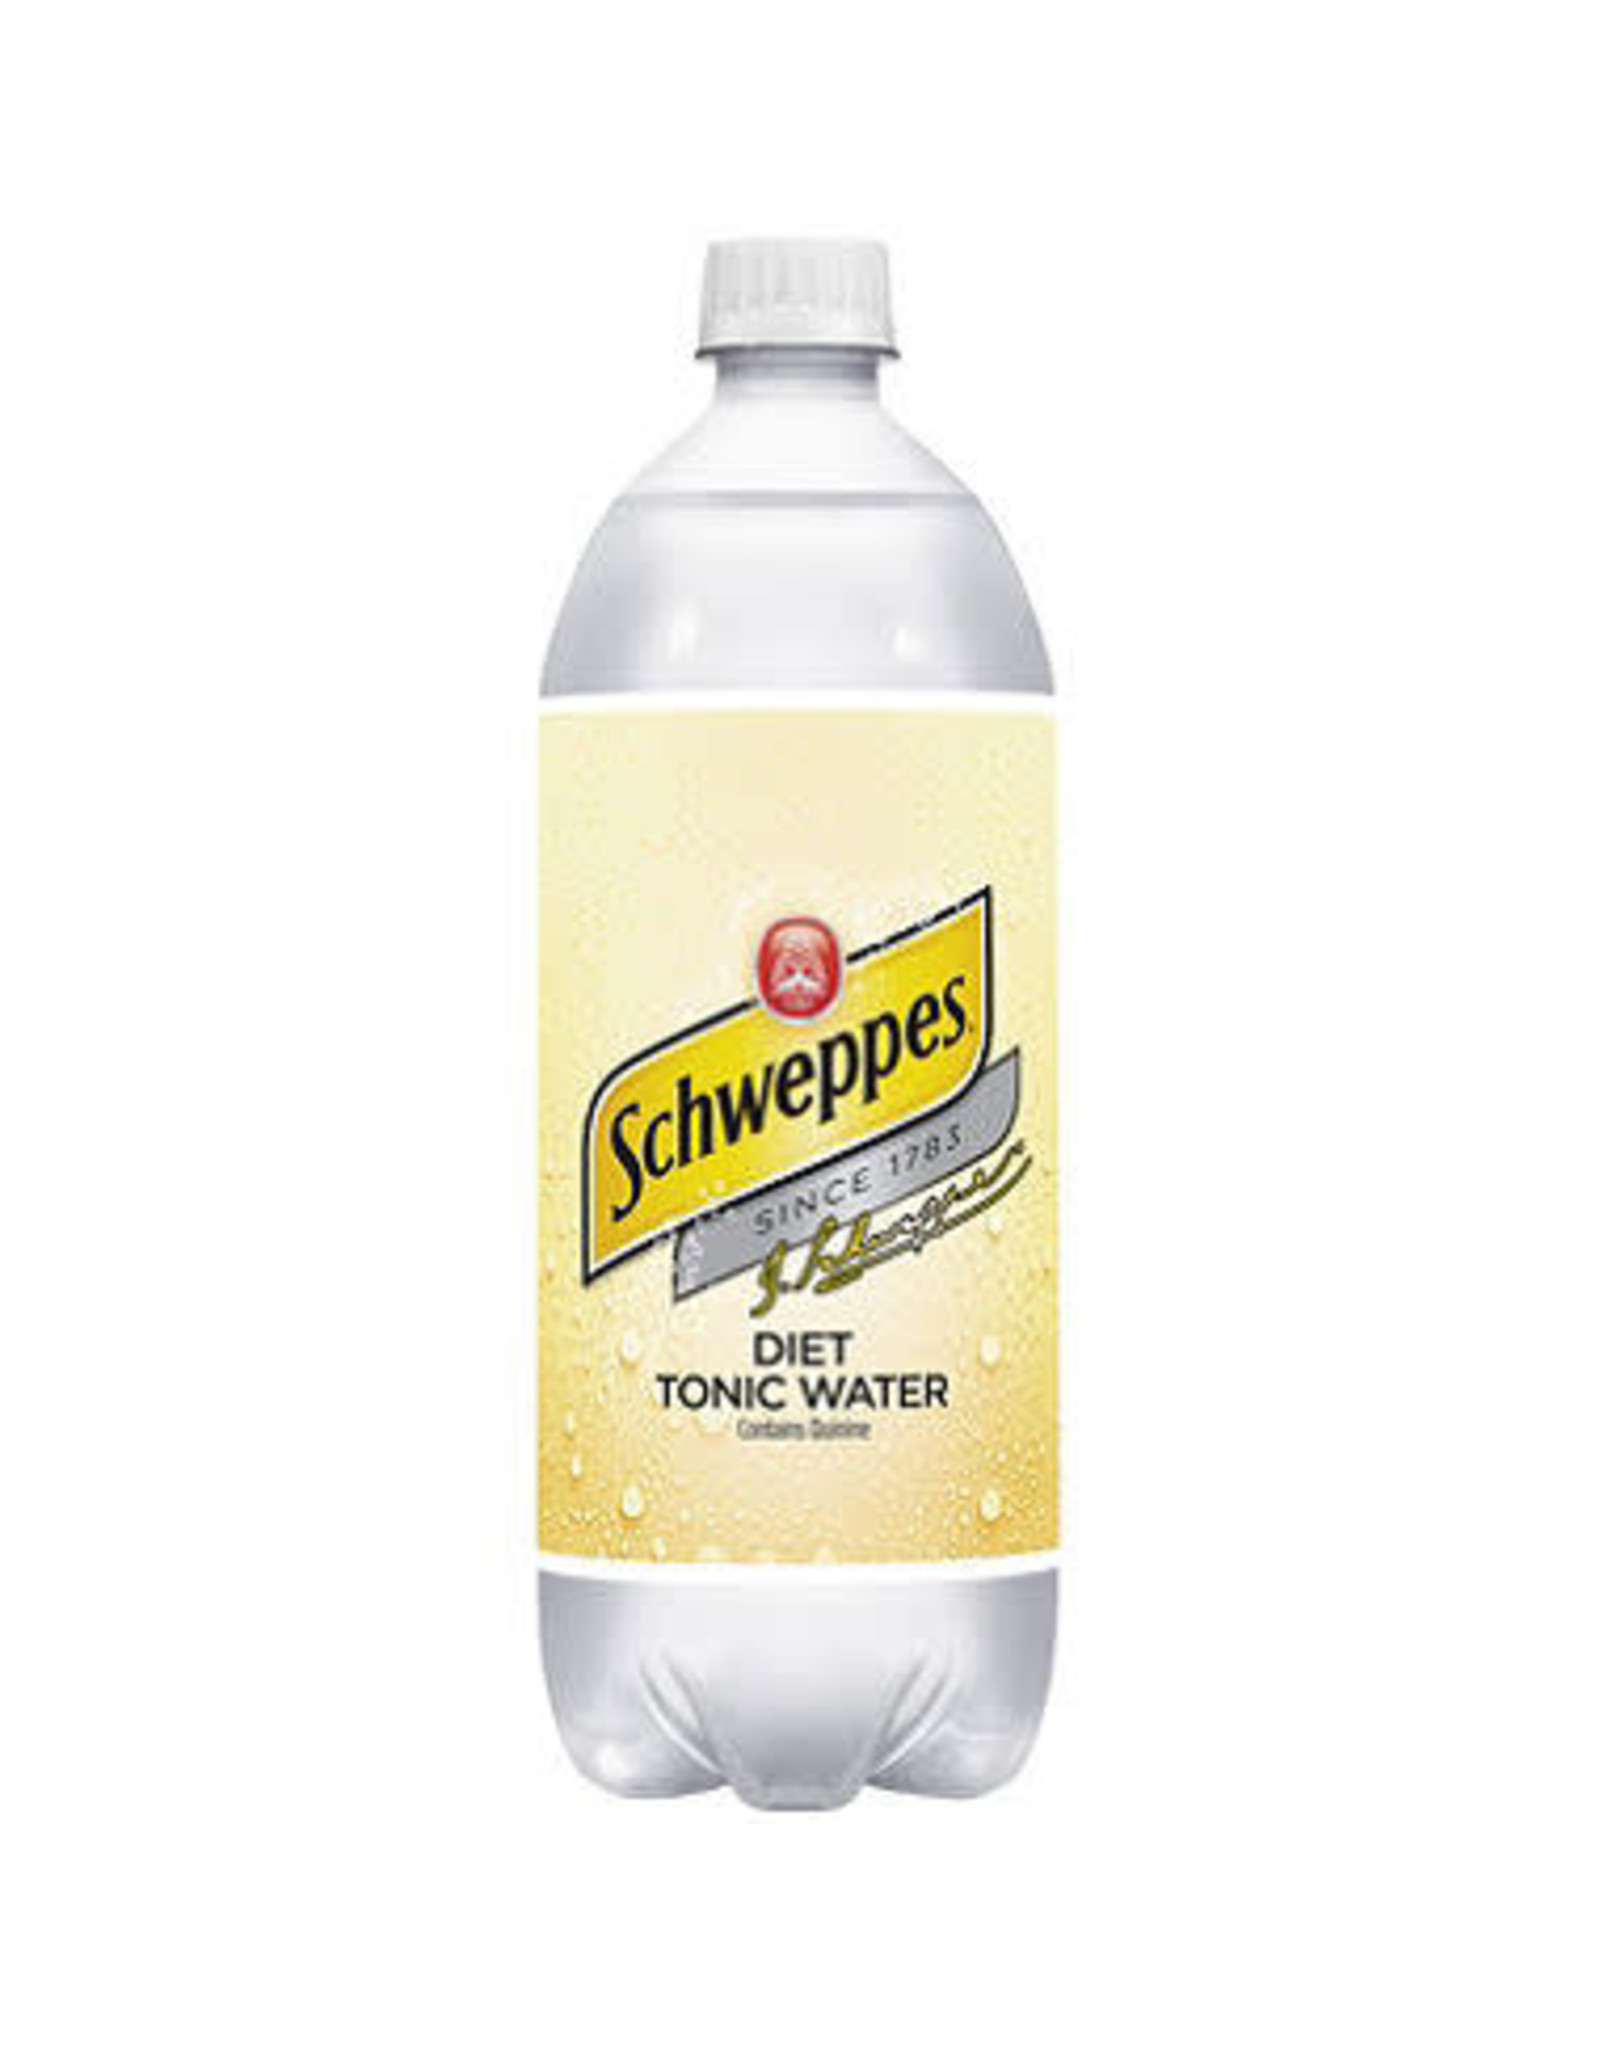 SCHWEPPES DIET TONIC WATER 1 LITER